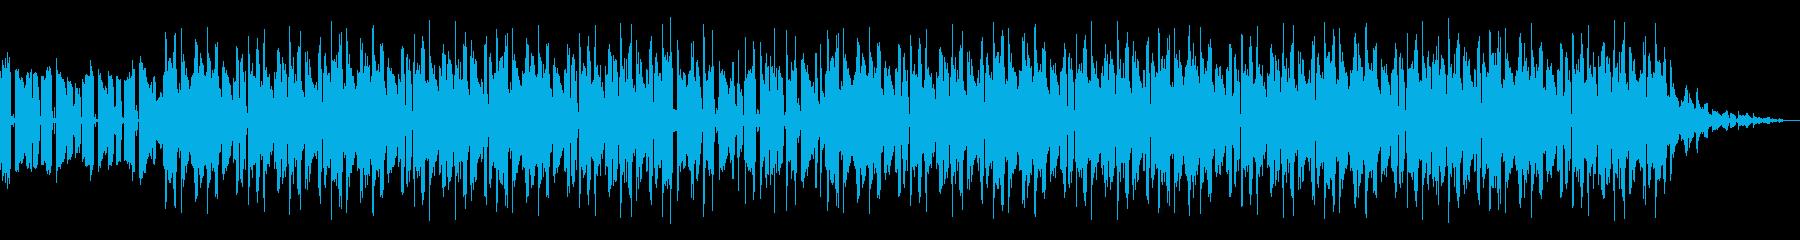 Chillhop ネオソウルギターの再生済みの波形